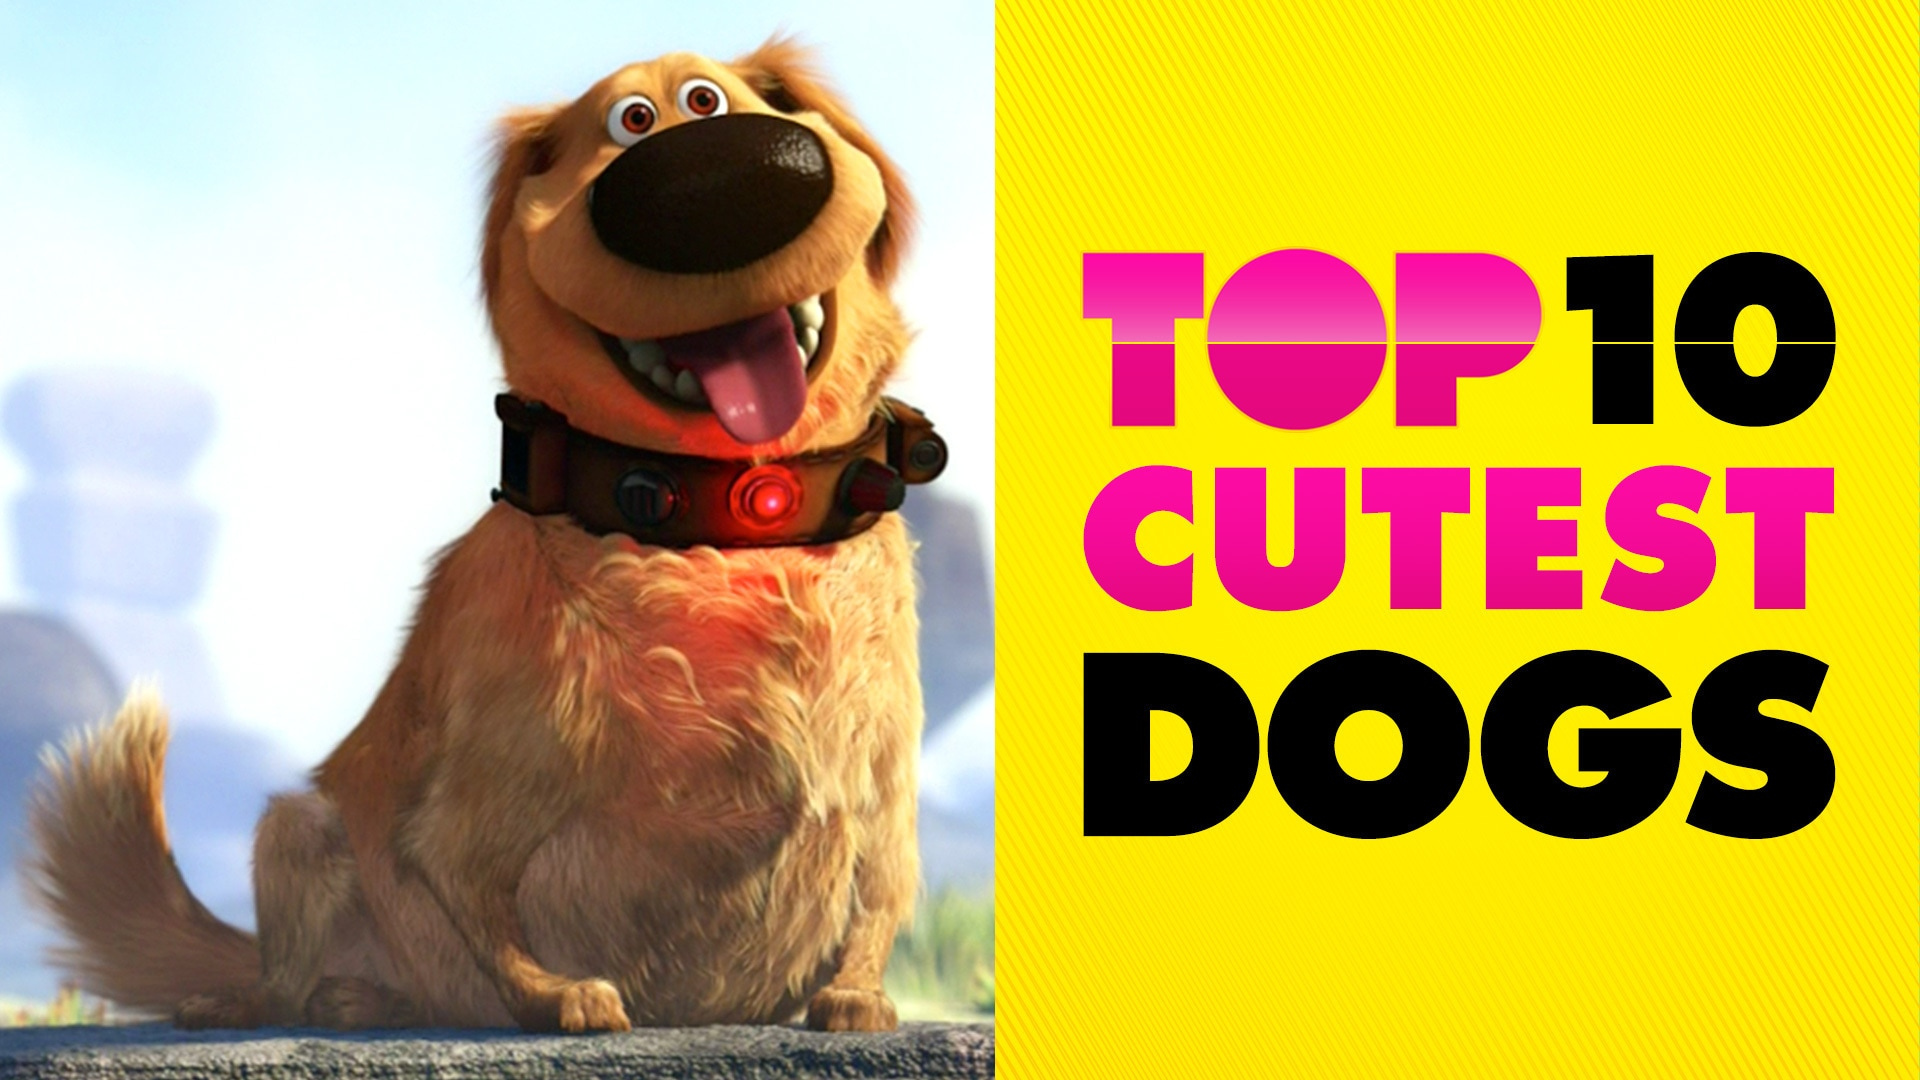 Cutest Dogs | Disney Top 10